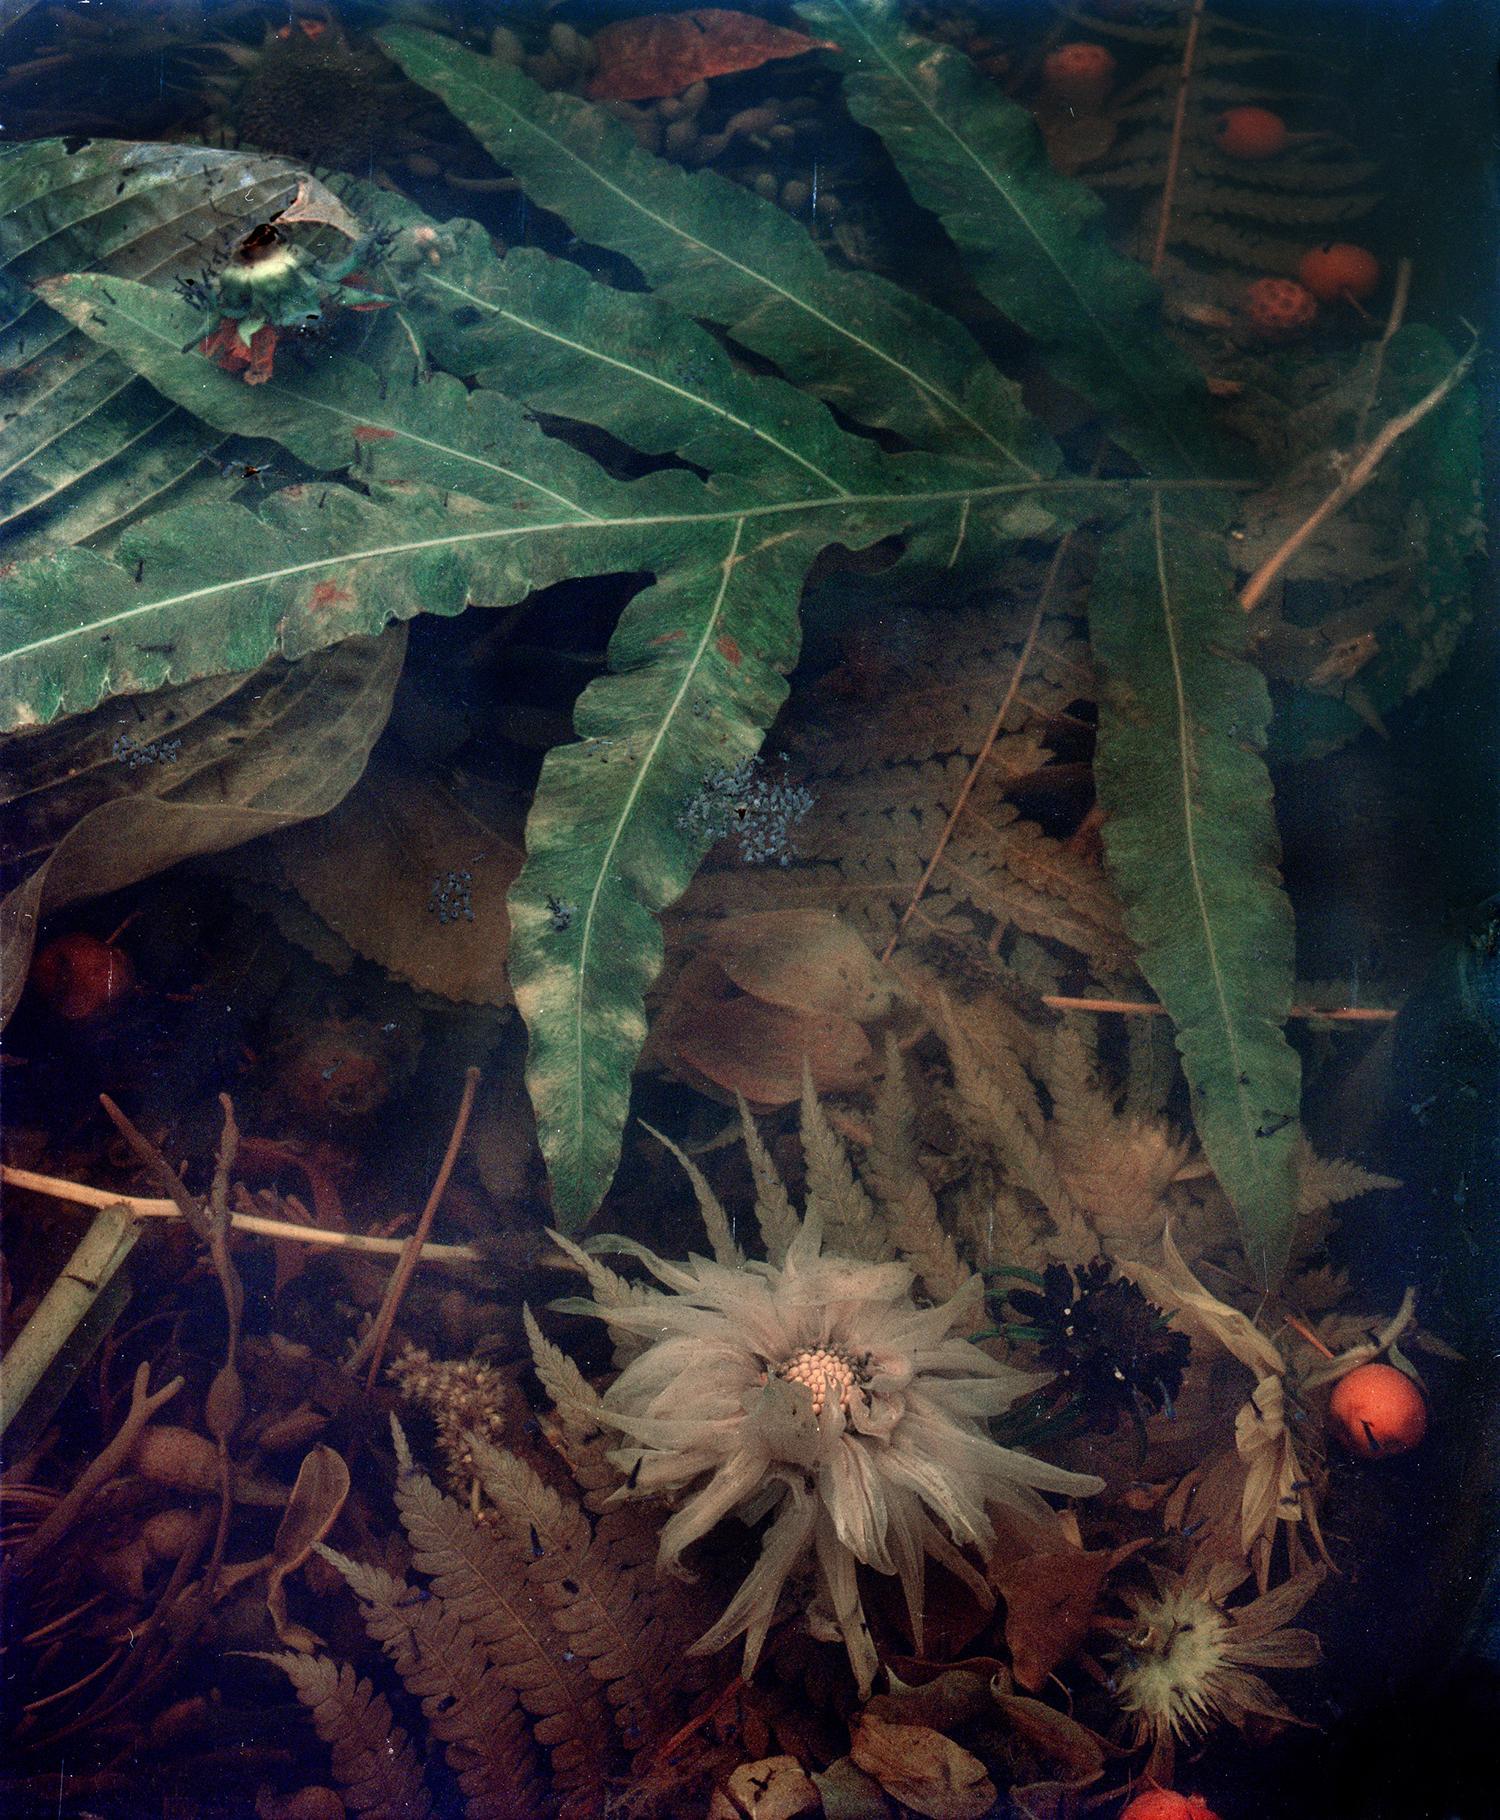 Dark Matter #8, Decomposing Dahlia, 2017 - Jocelyn Lee (Colour Photography)